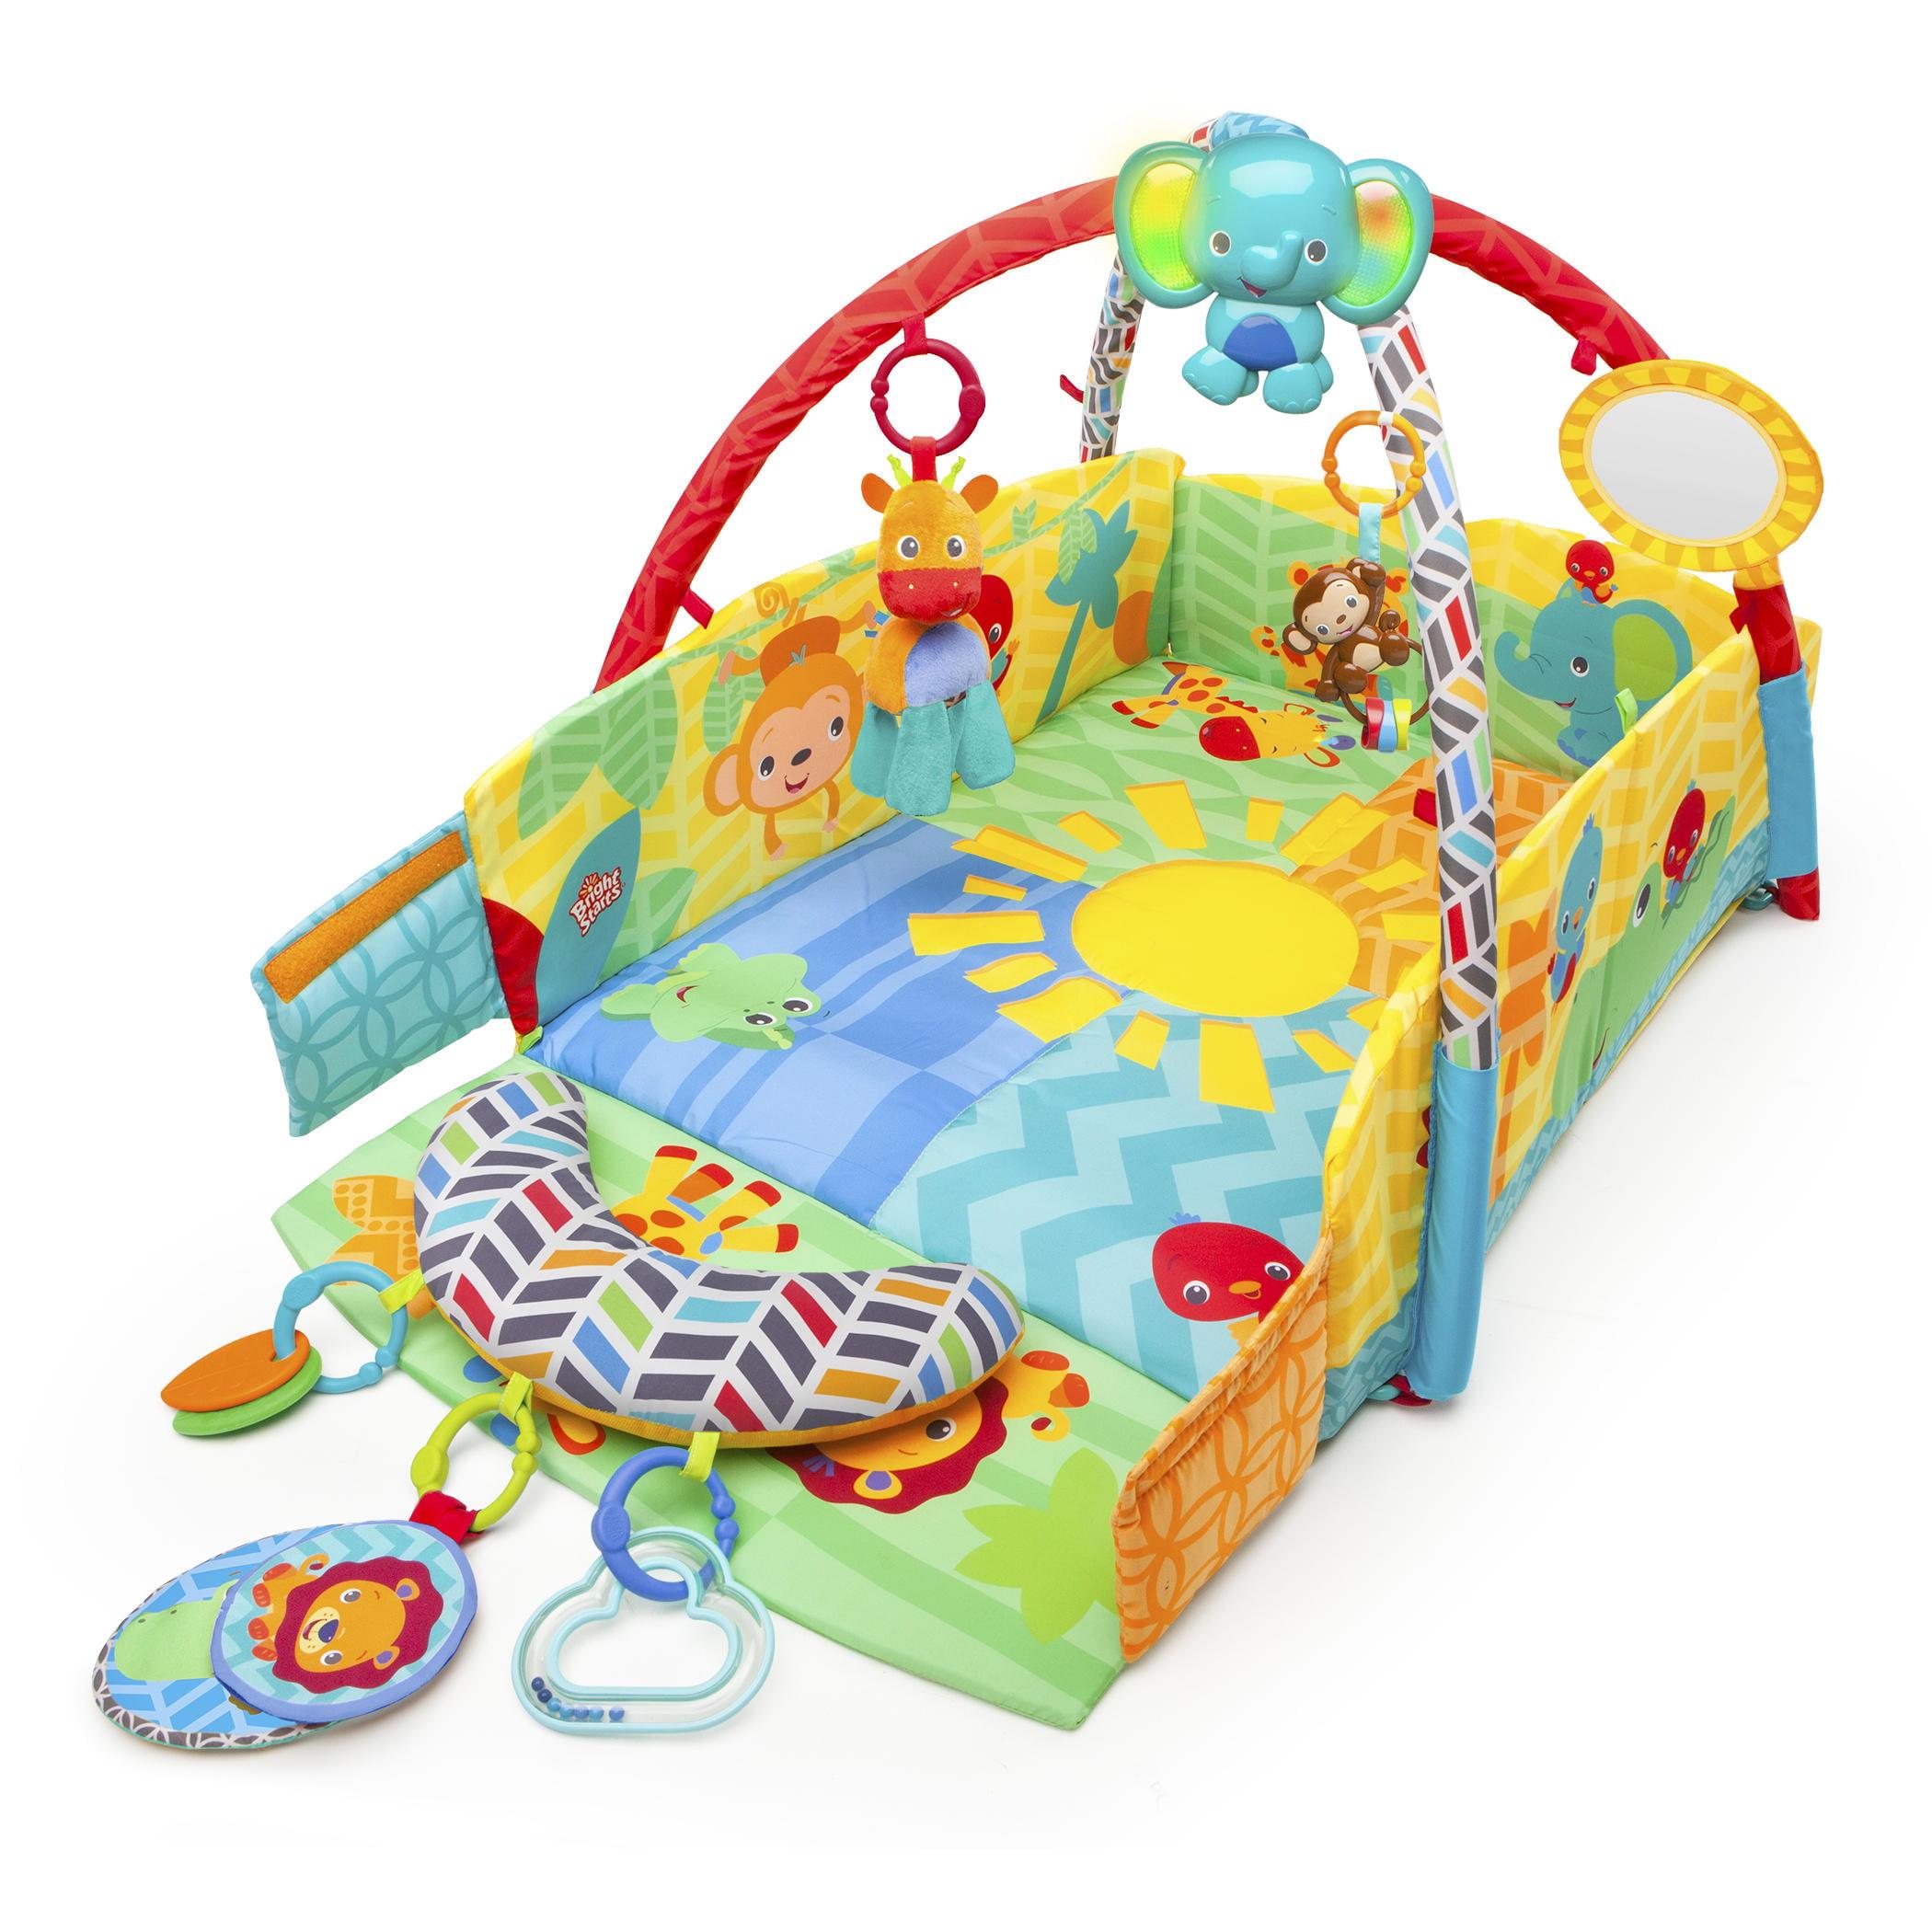 Bright Starts Sunny Safari Baby's Play Place Activity Gym